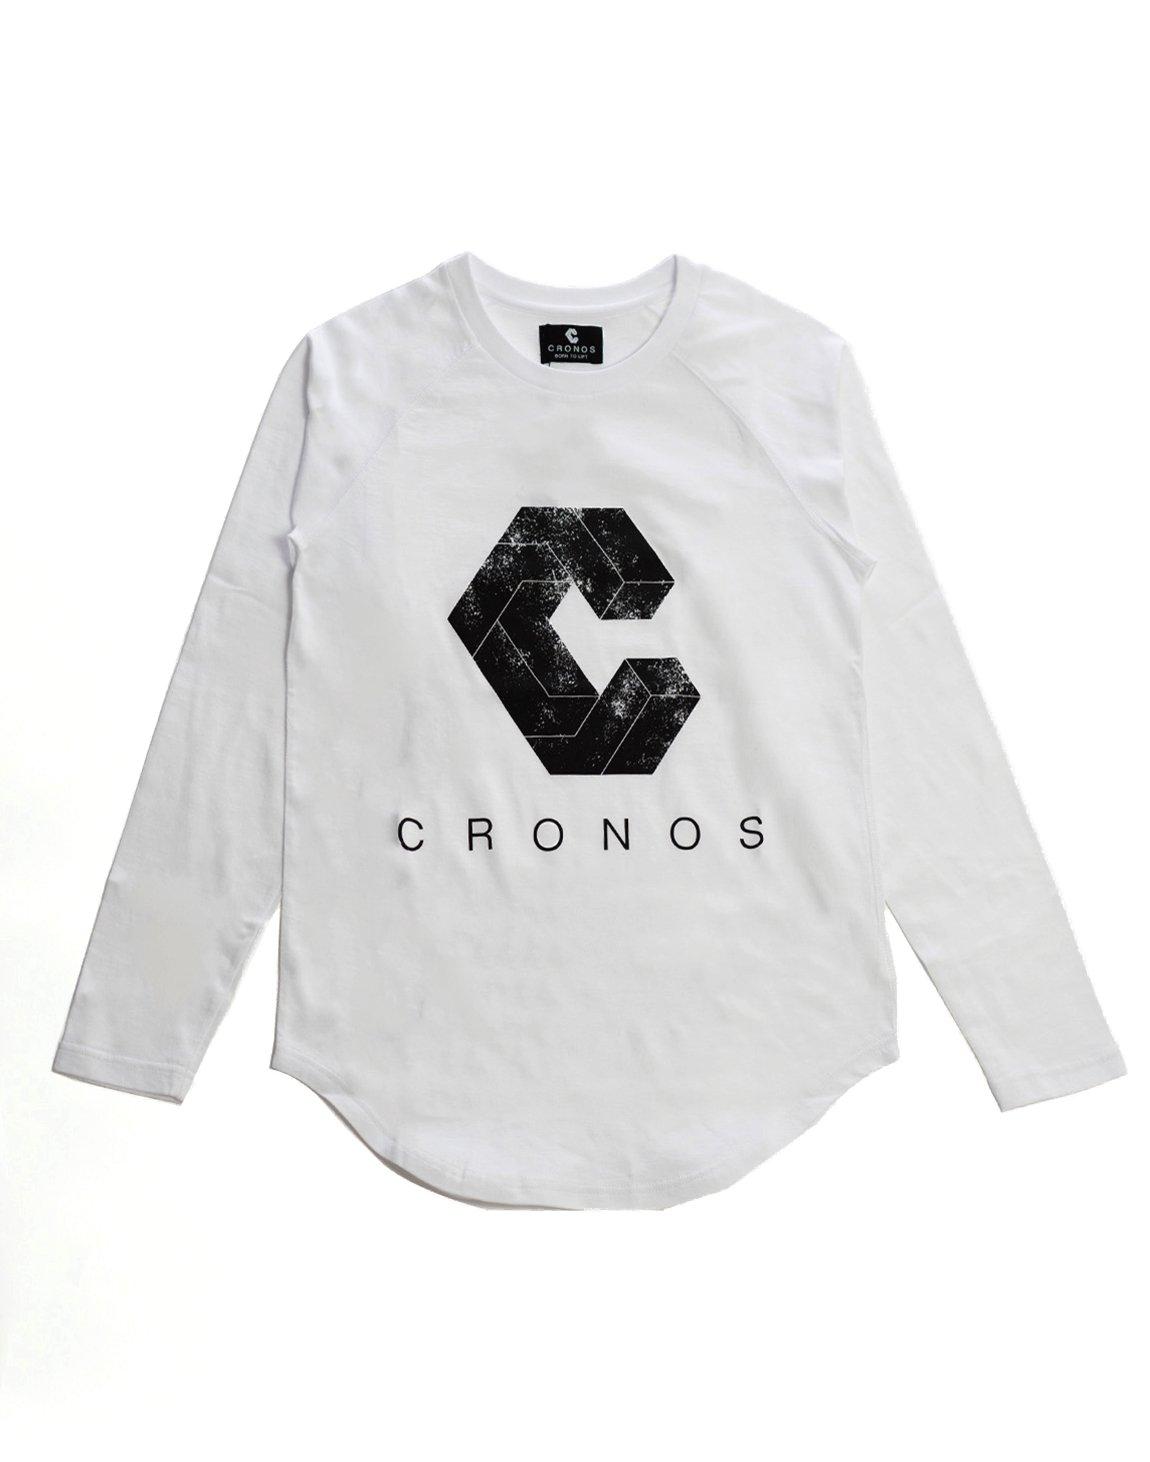 CRONOS CLASSIC LOG LONGSLEEVE WHITE